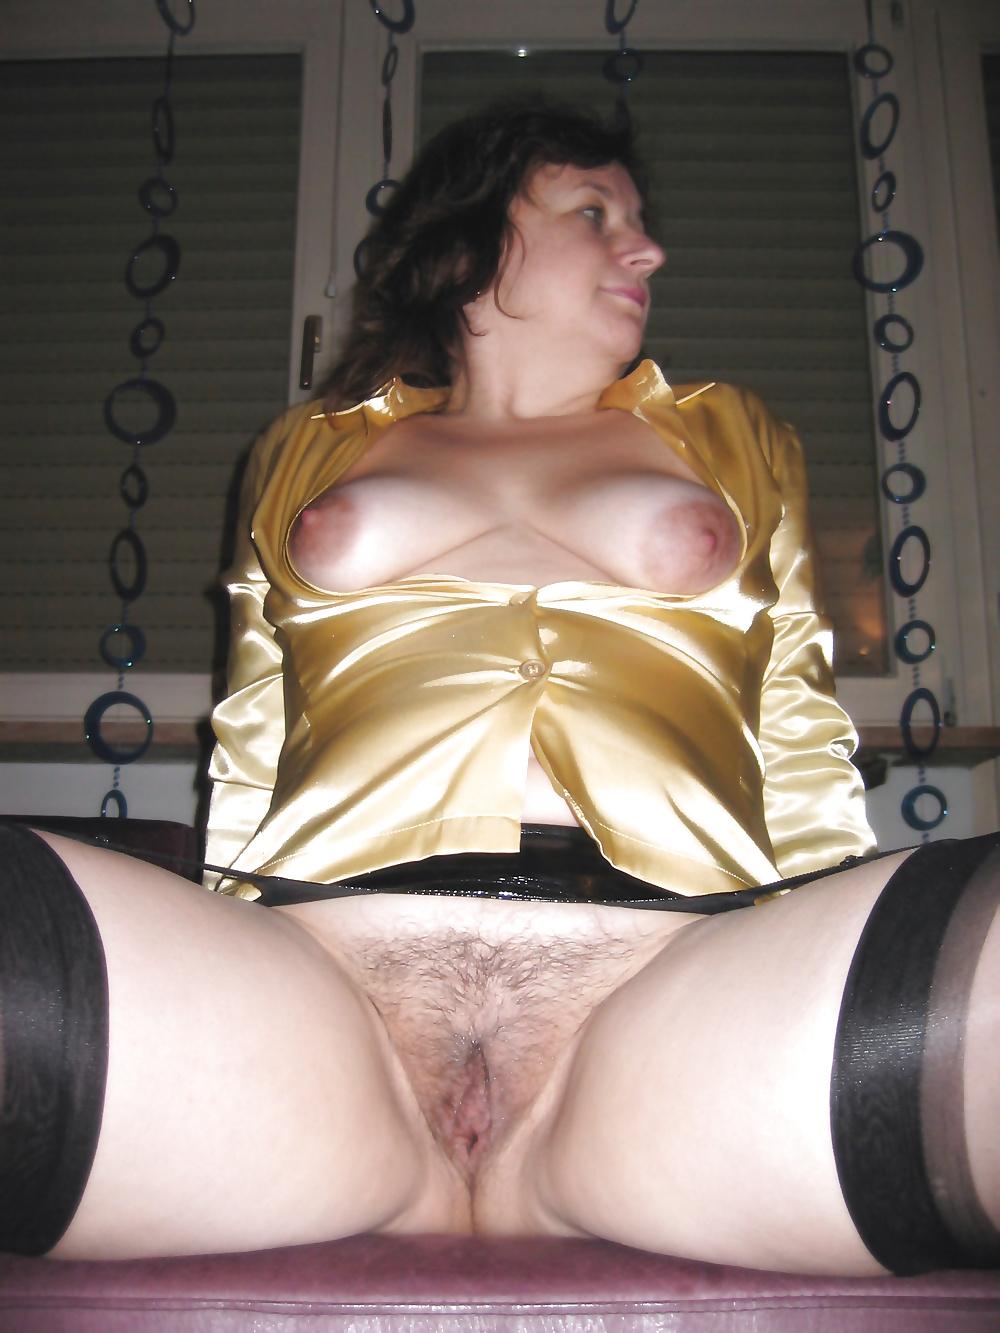 Fuck Her Black Pussy Hard Scenes